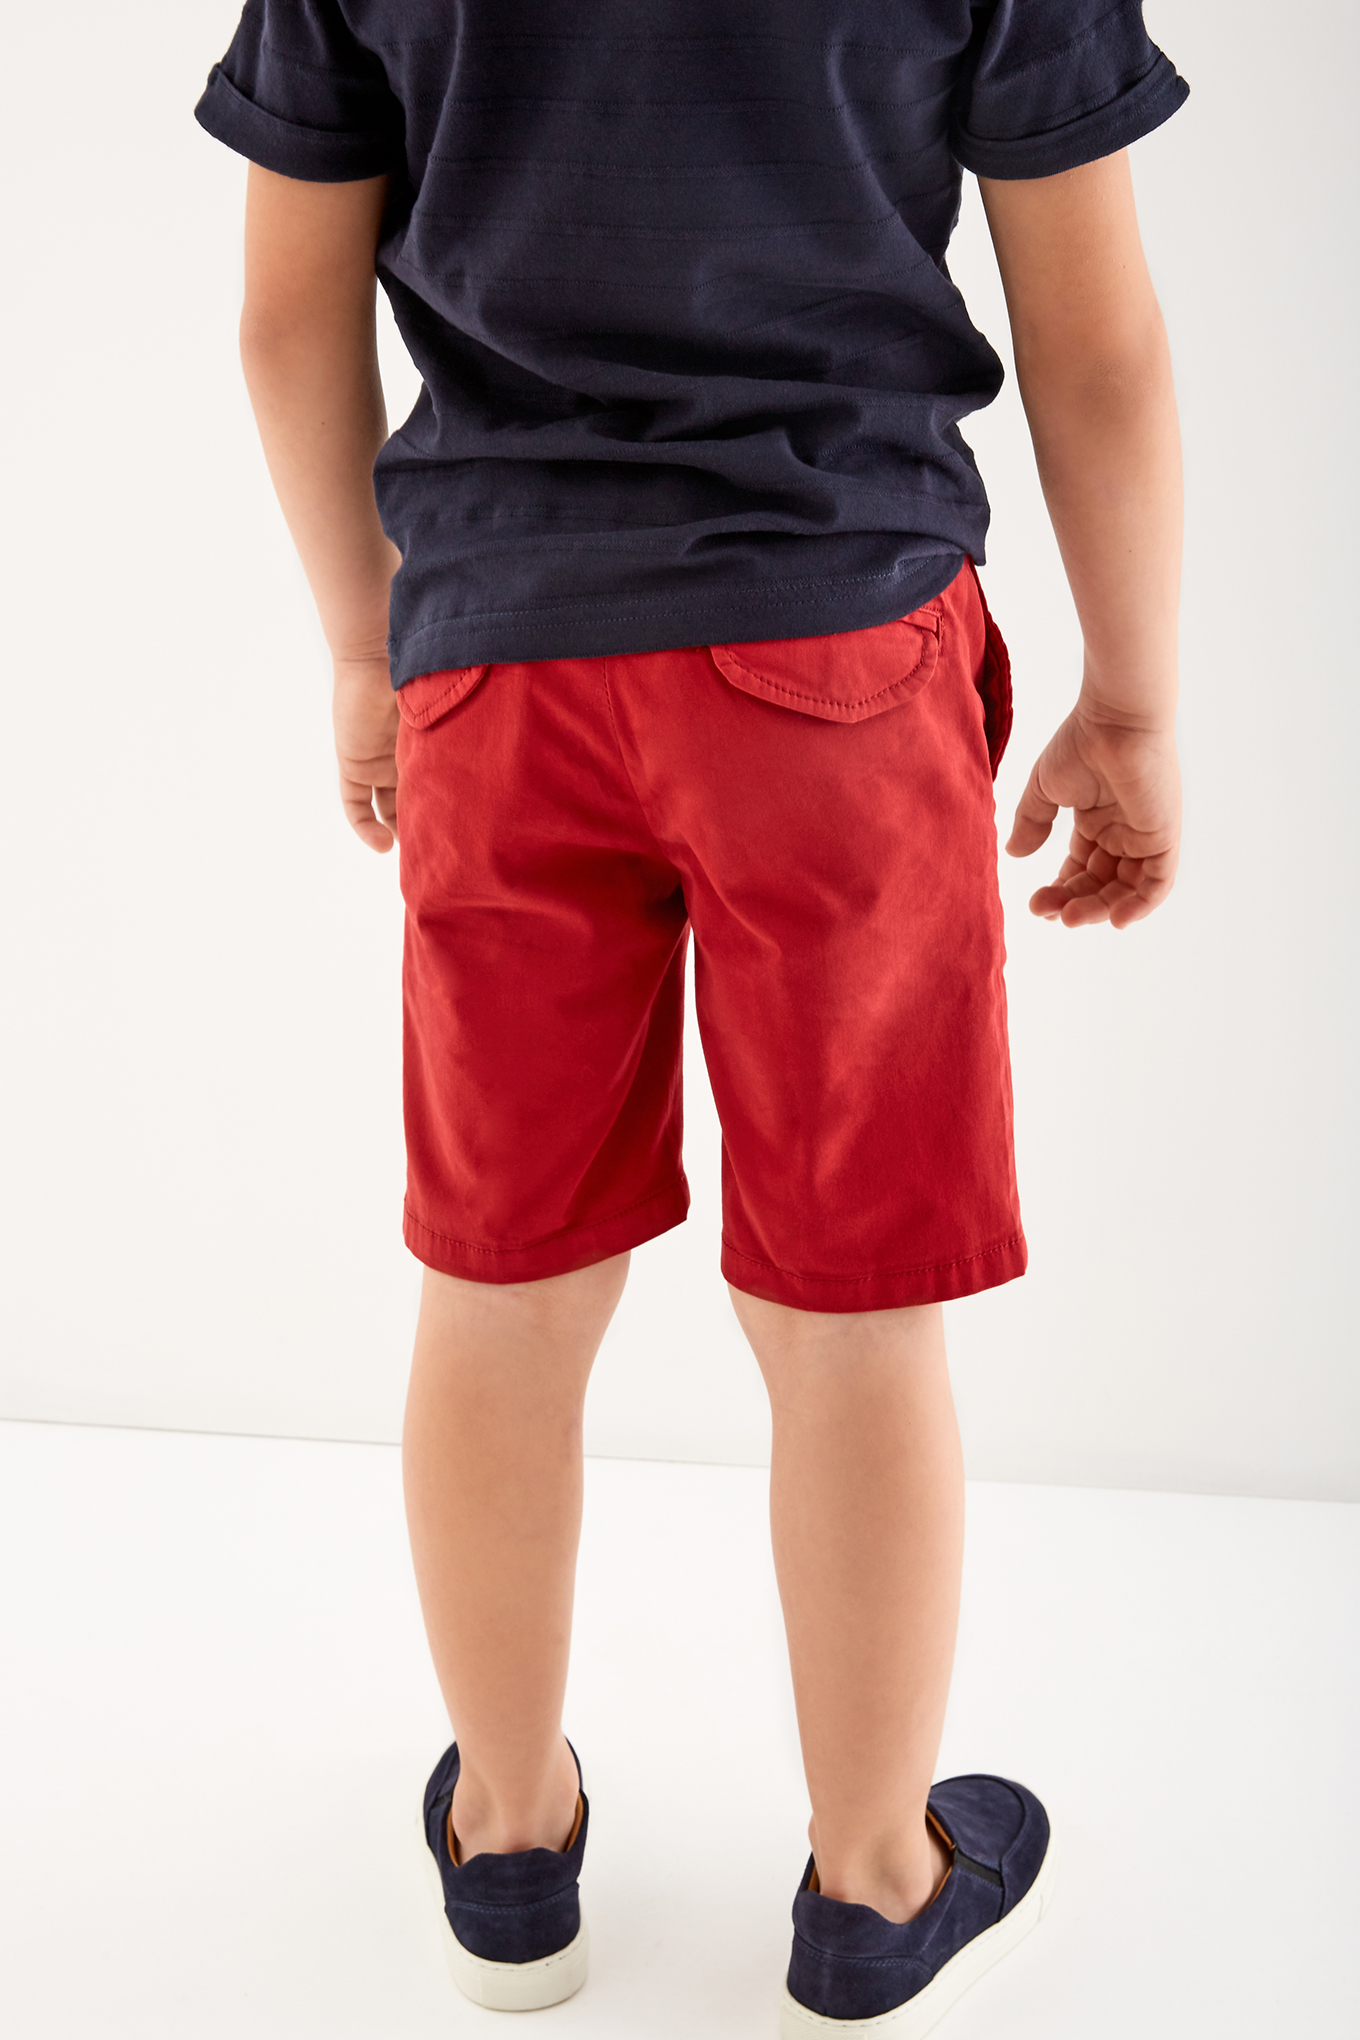 Bermuda Red Casual Boy